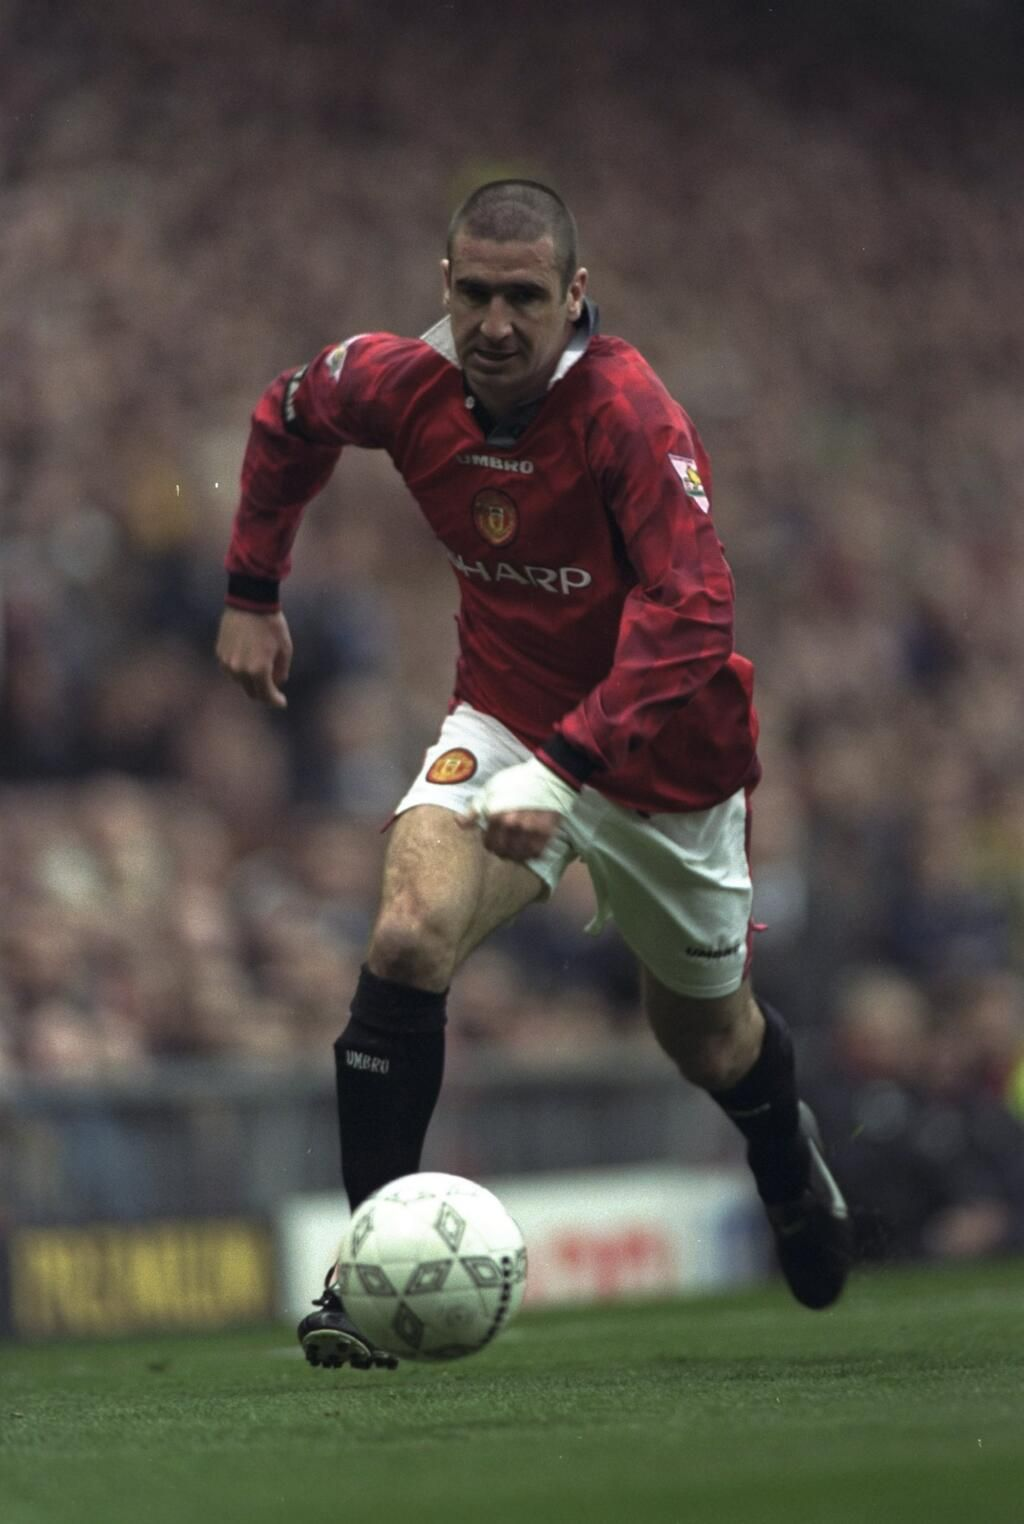 Eric Cantona, France (AJ Auxerre, Martigues, Olympique Marseille, Bordeaux, Montpellier, Nimes Olympique, Leeds United, Manchester United, France)